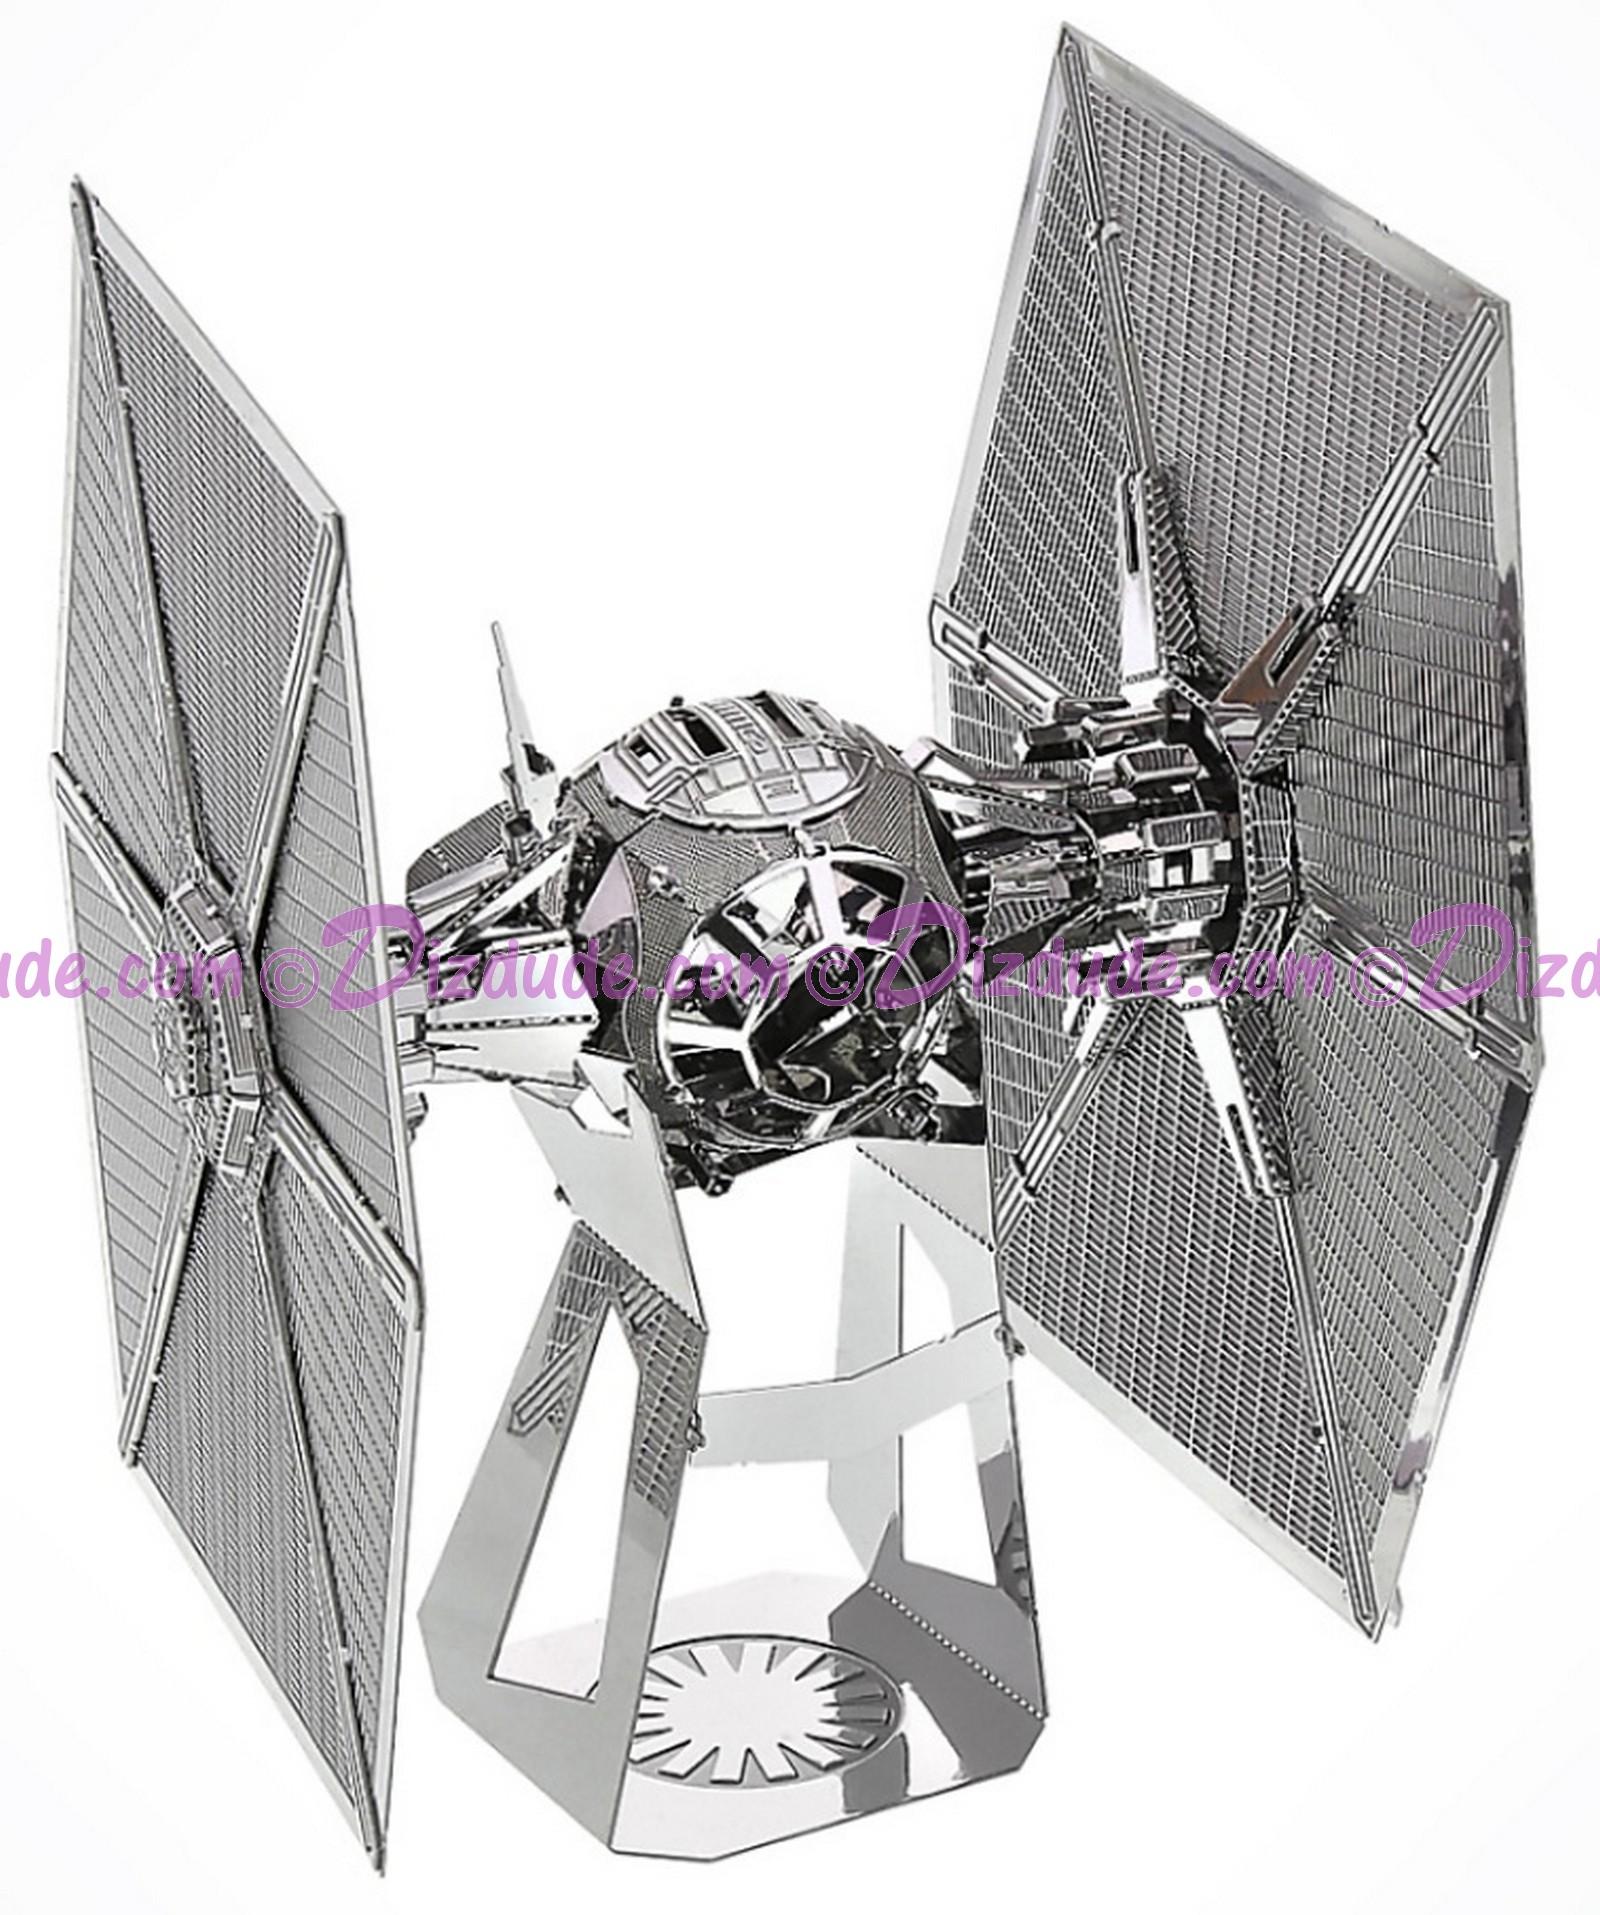 The Force Awakens Special Forces TIE Fighter 3D Metal Model Kit ~ Disney Star Wars © Dizdude.com